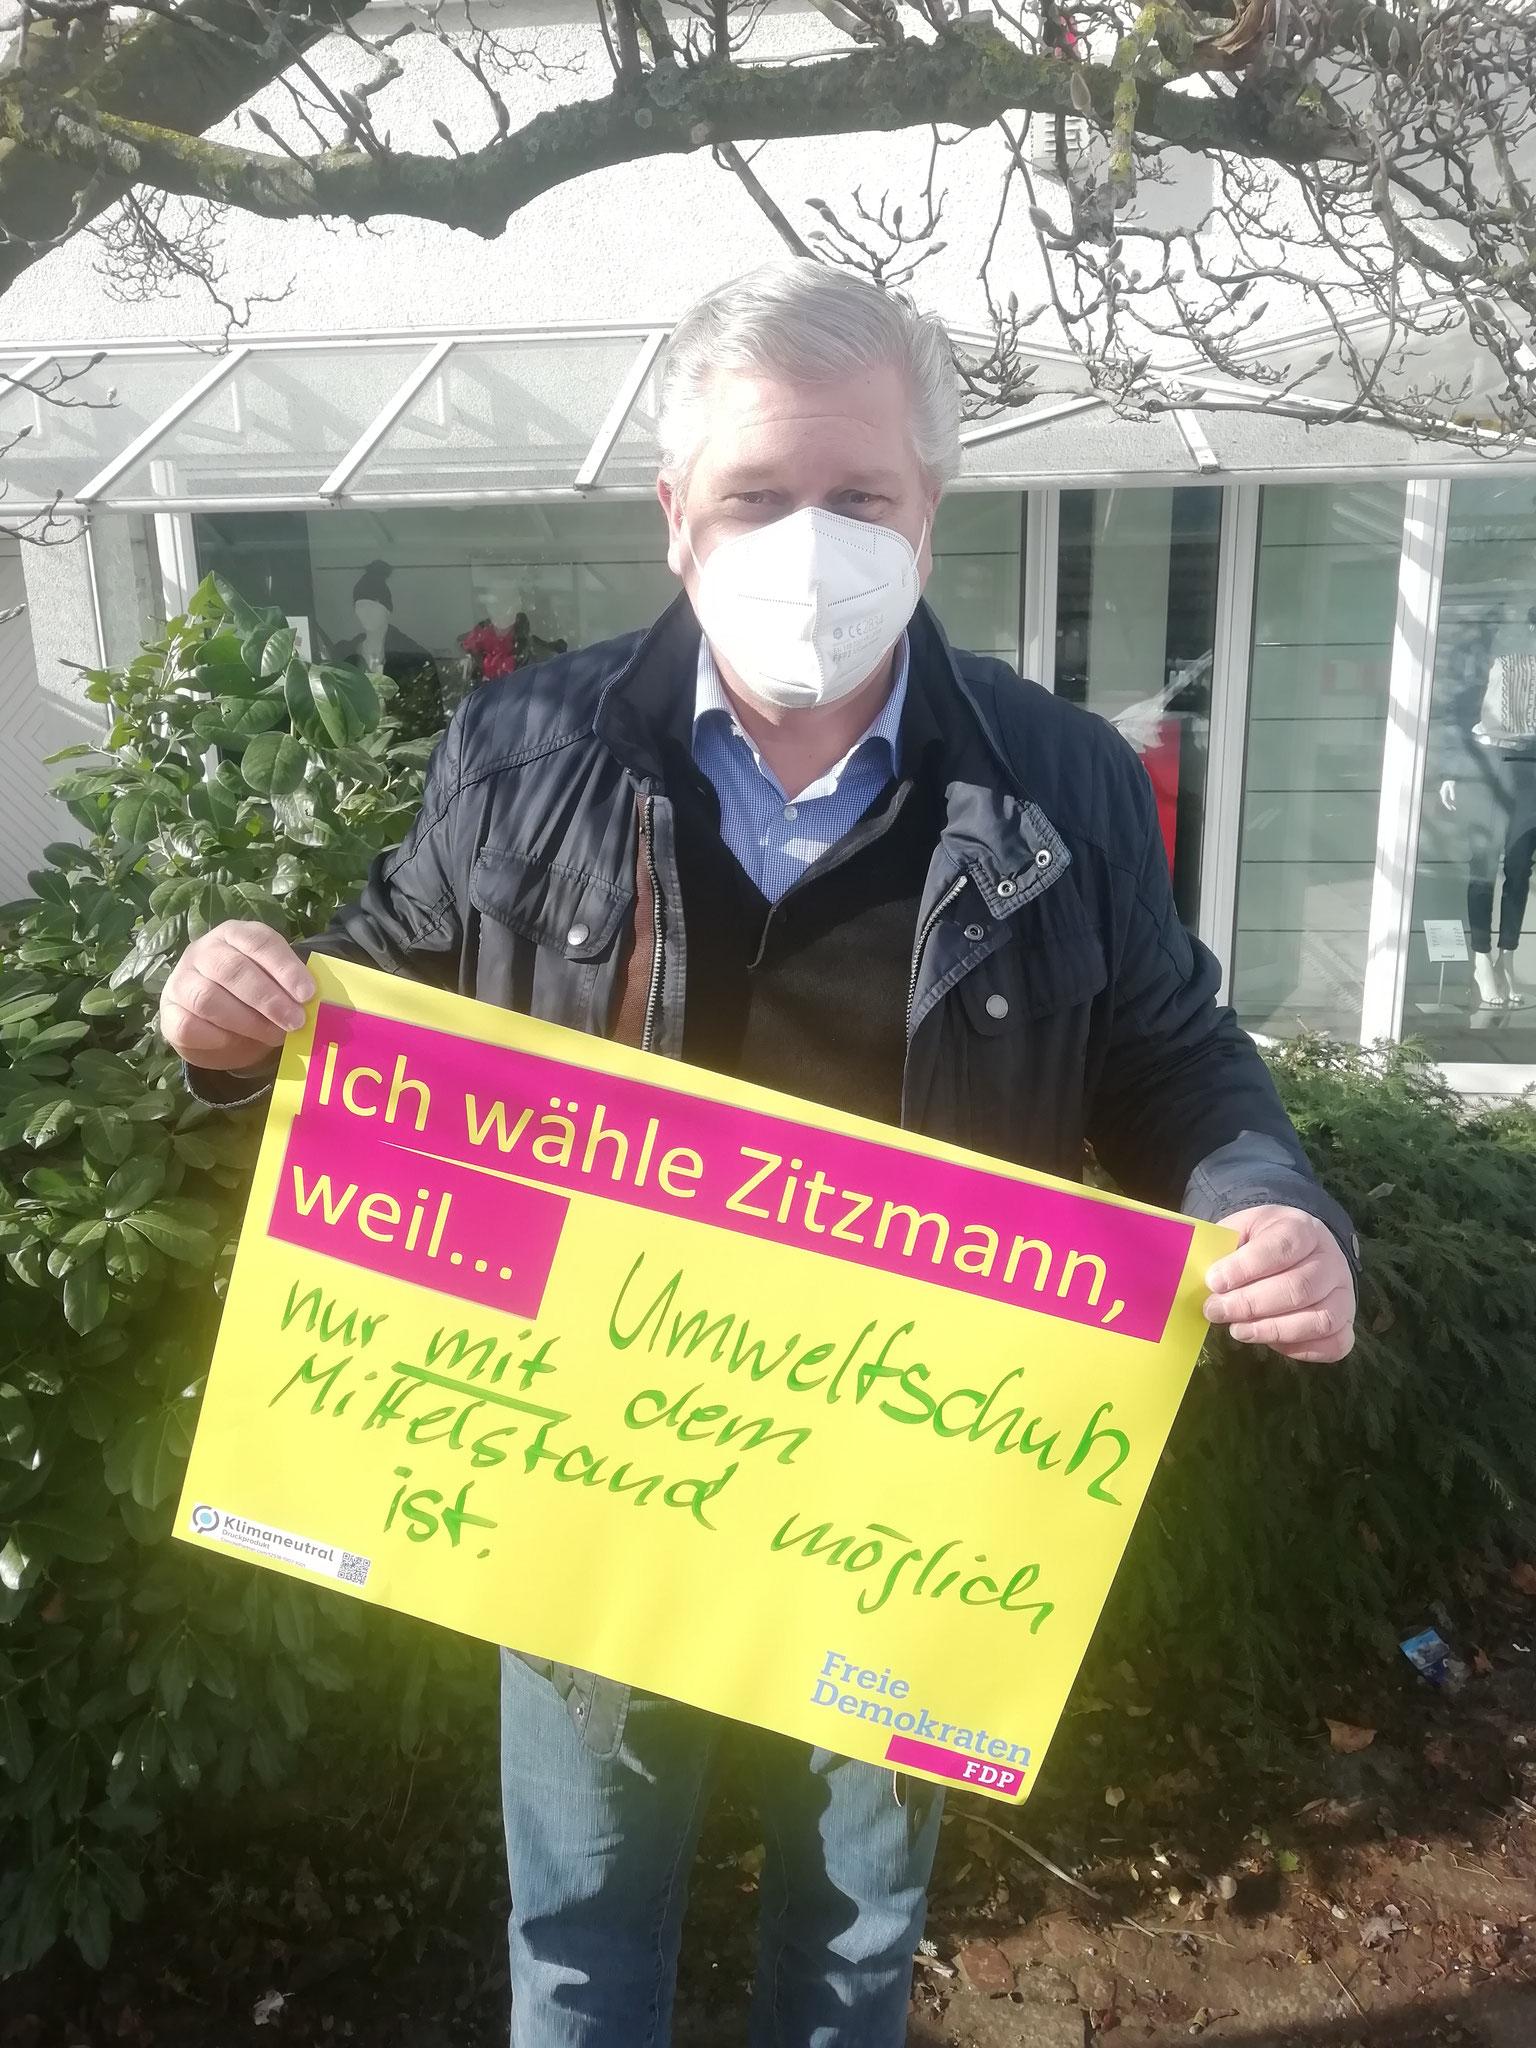 Jochen Nigge